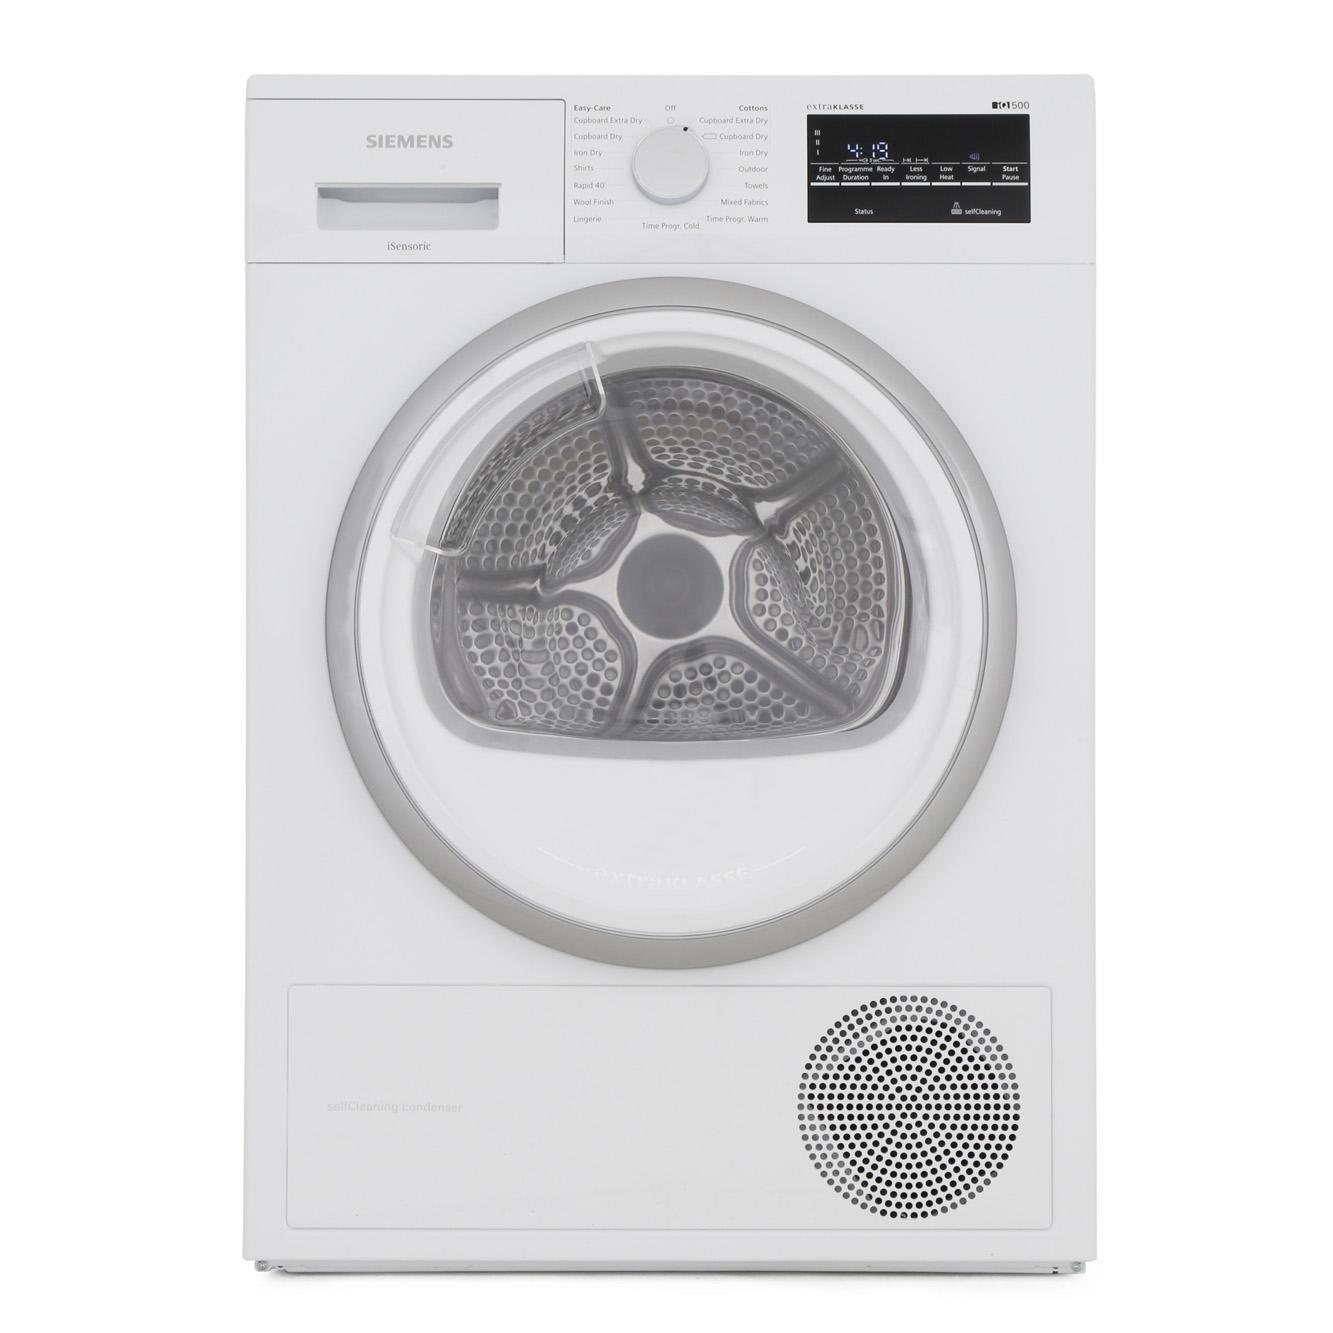 Siemens iQ500 WT45W492GB iSensoric Condenser Dryer